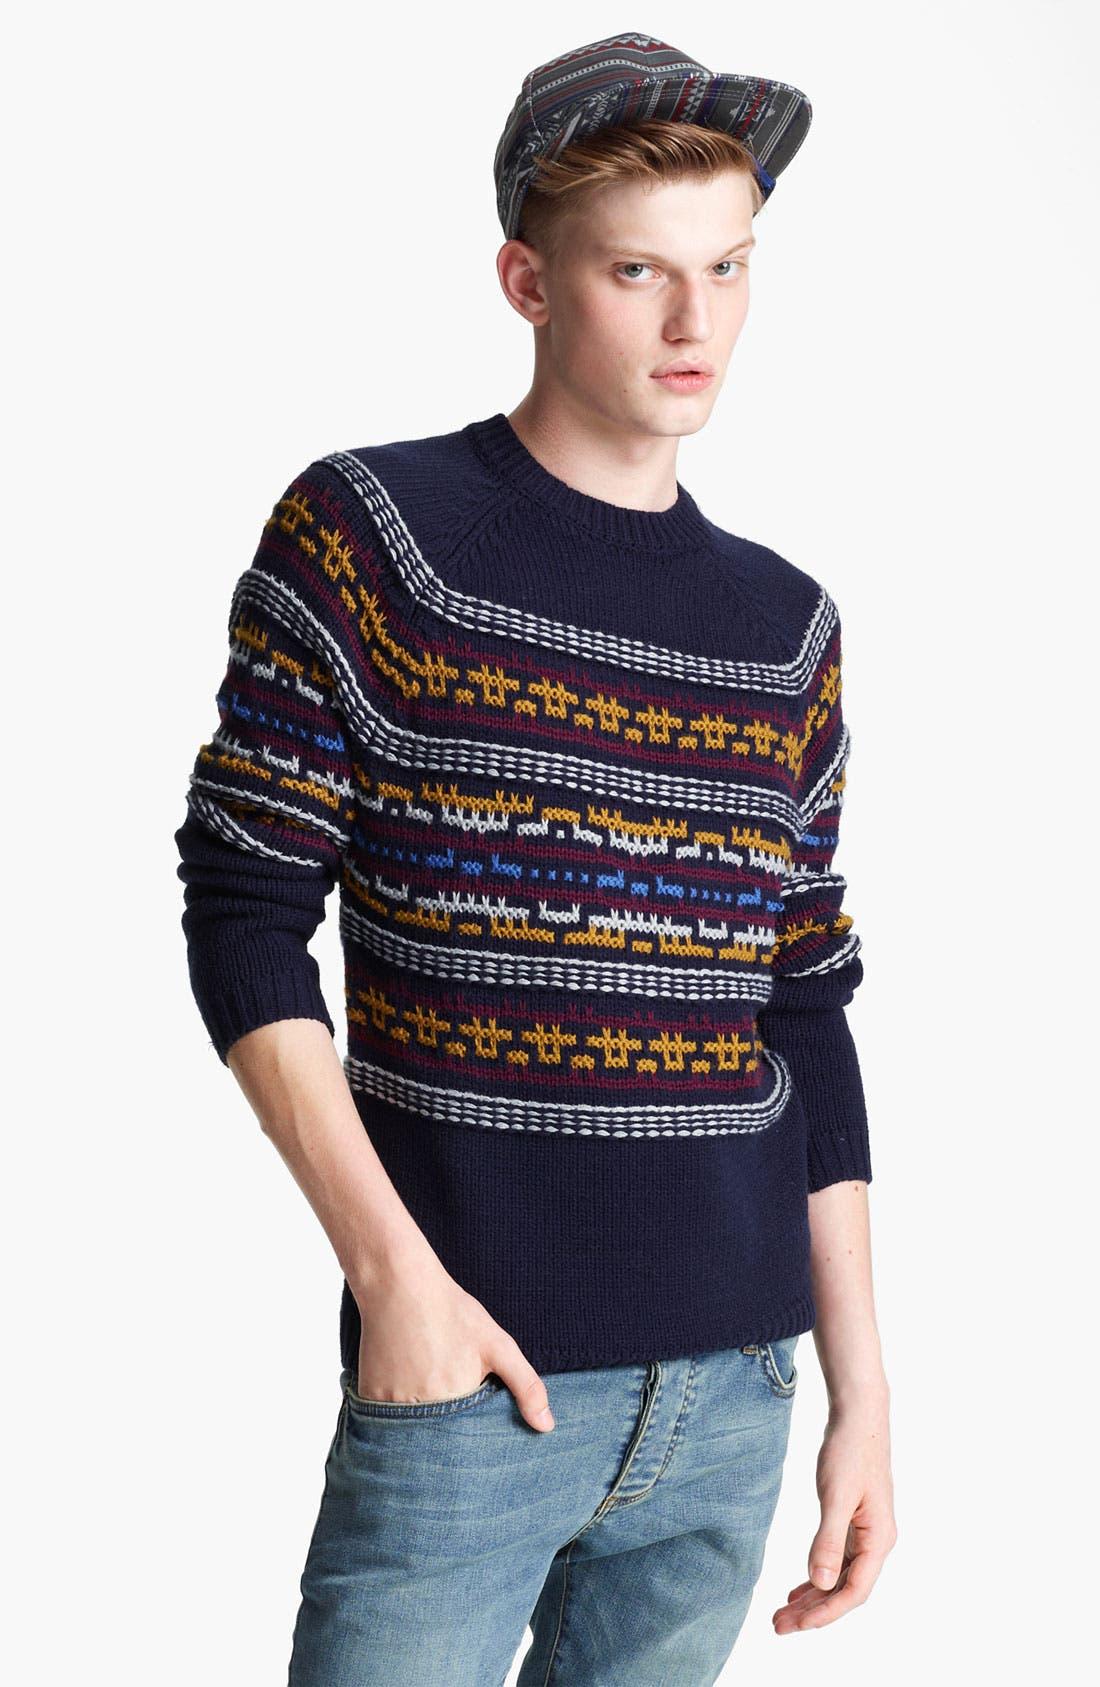 TOPMAN 'Computer Pattern' Crewneck Sweater, Main, color, 410